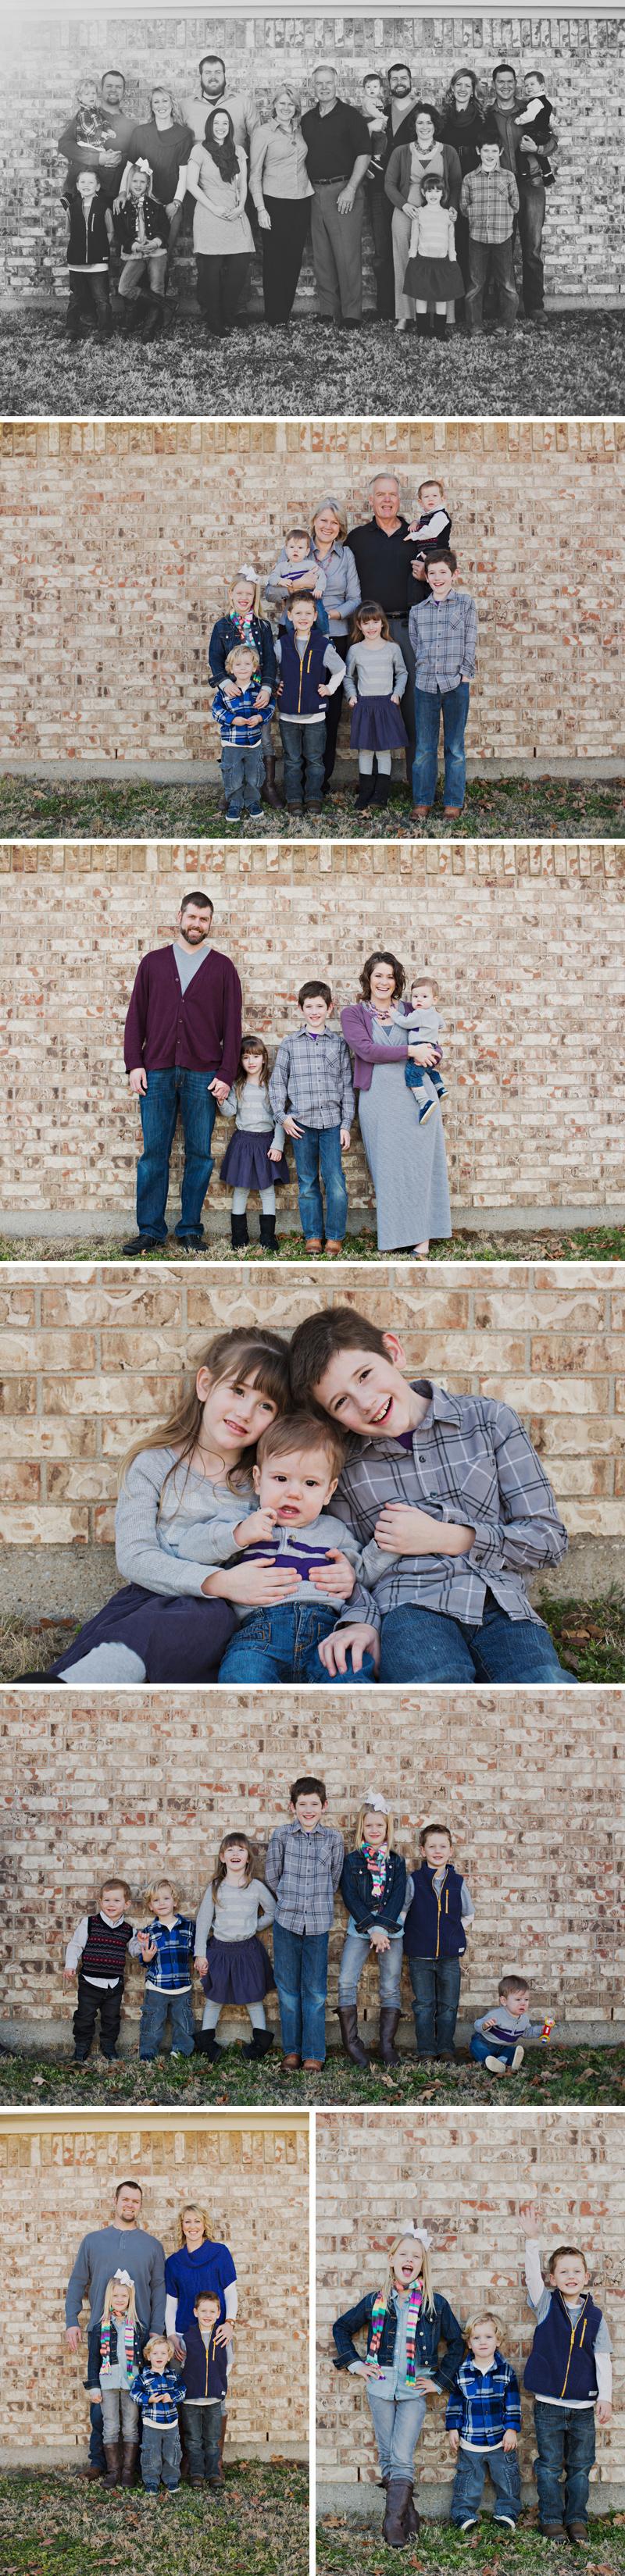 Dallas-Family-Photographerc004